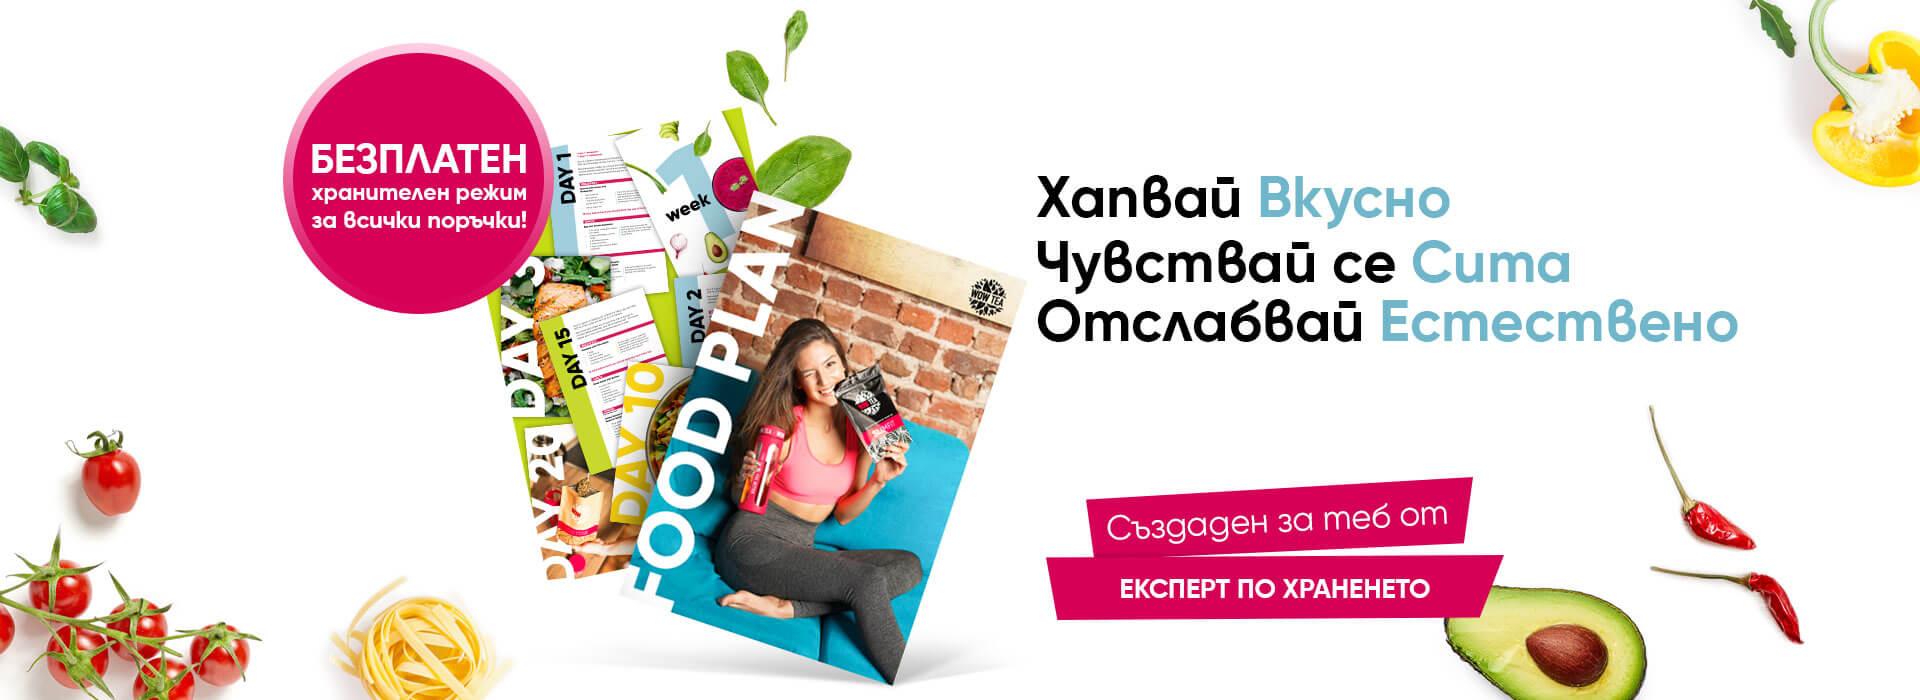 BG_food-plan-desktop